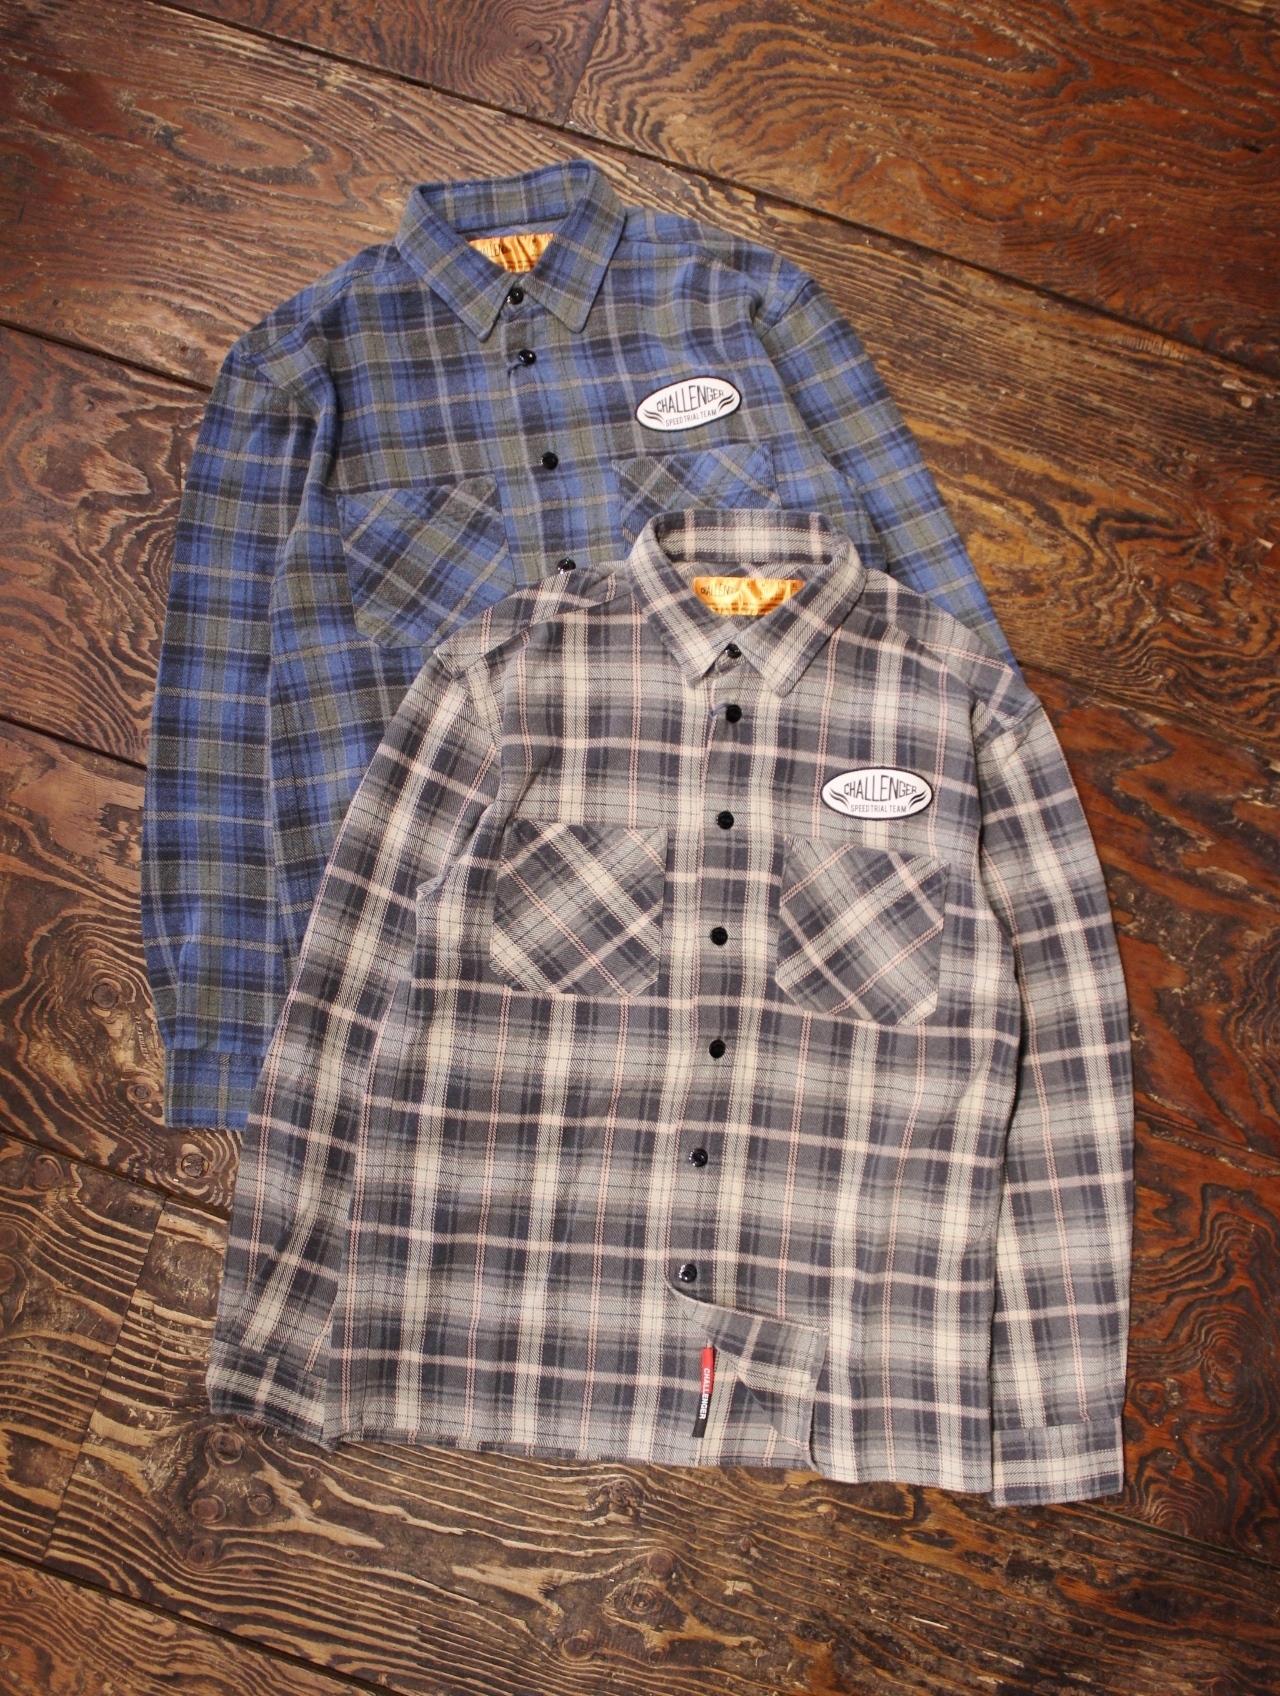 CHALLENGER   「ORIGINAL CHECK NEL SHIRT」 チェックネルシャツ